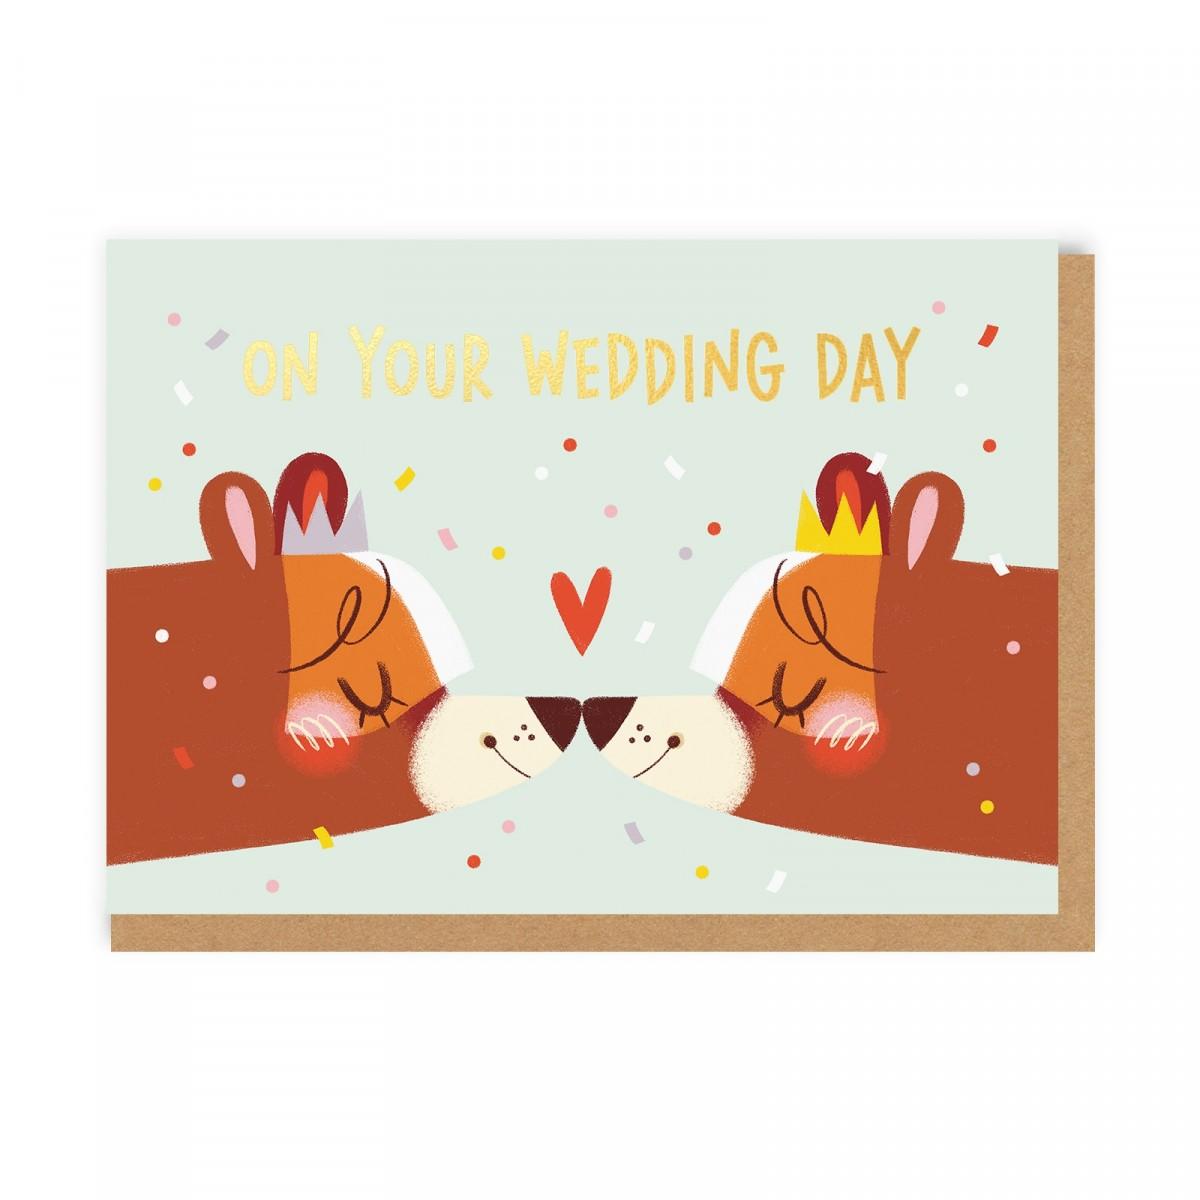 msy-gc-013-a6-lady-wedding-bears.jpg